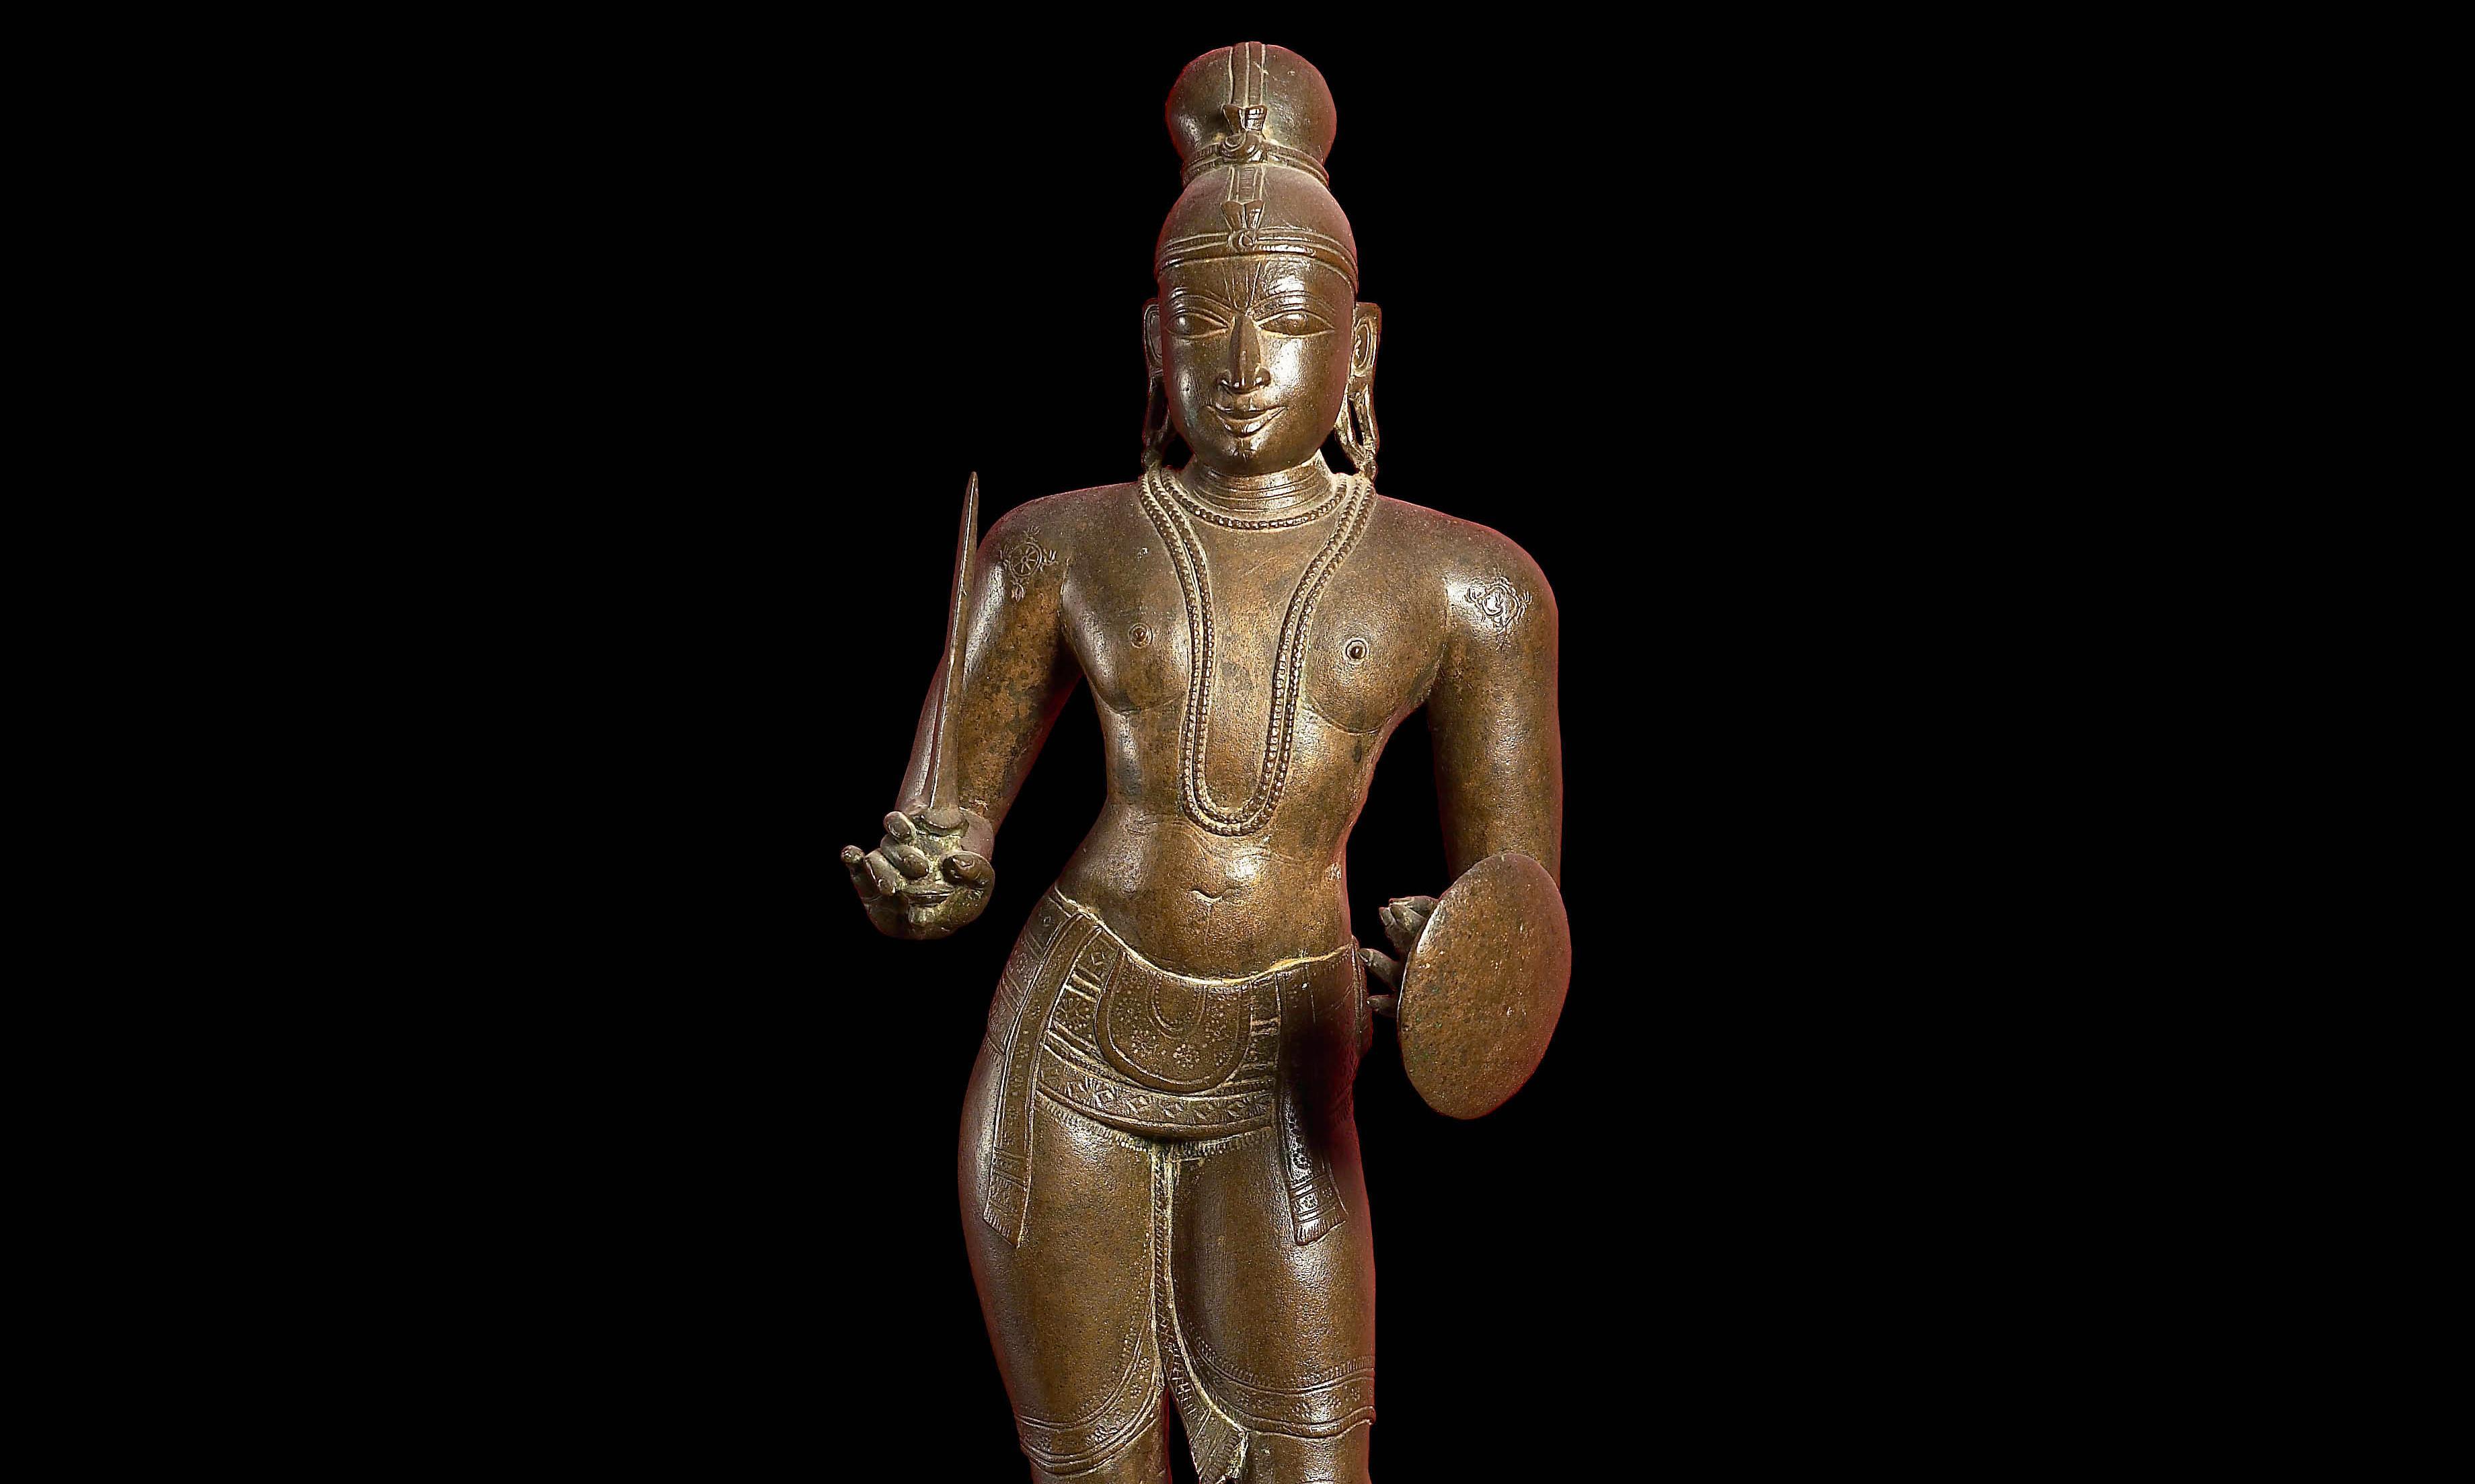 India asks Oxford museum to return 'stolen' bronze statue